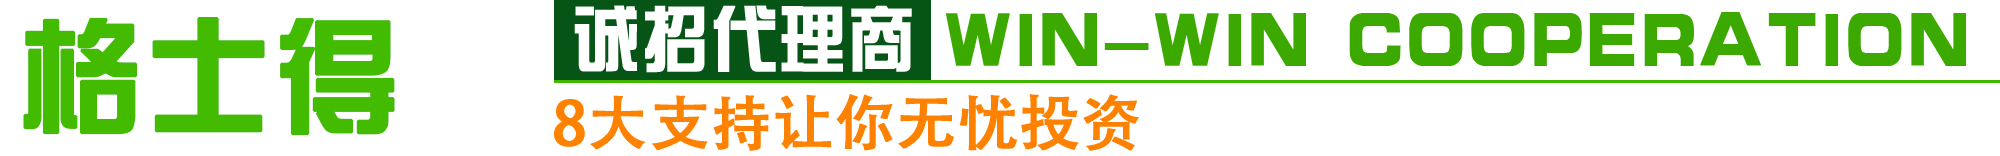 Betway必威_寻找代理商8大支持让你无忧投资